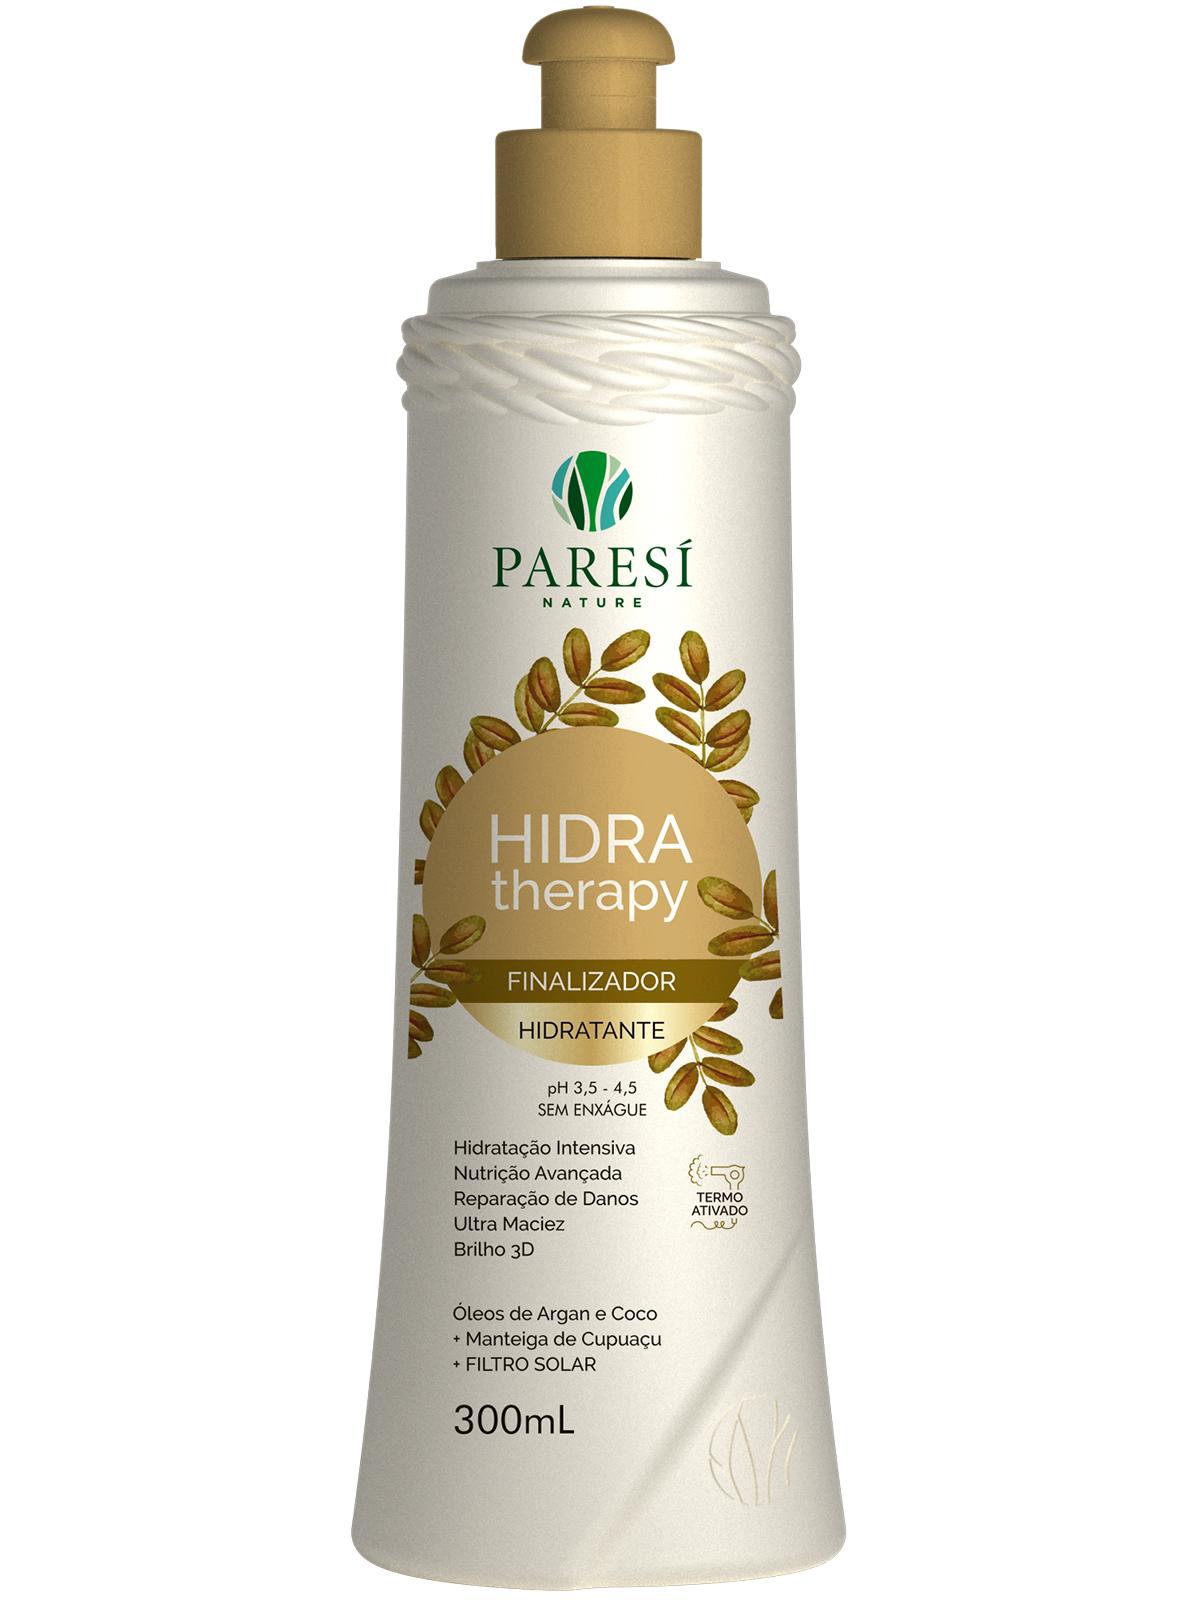 Finalizador Hidratante Hidra Therapy - Paresí Nature